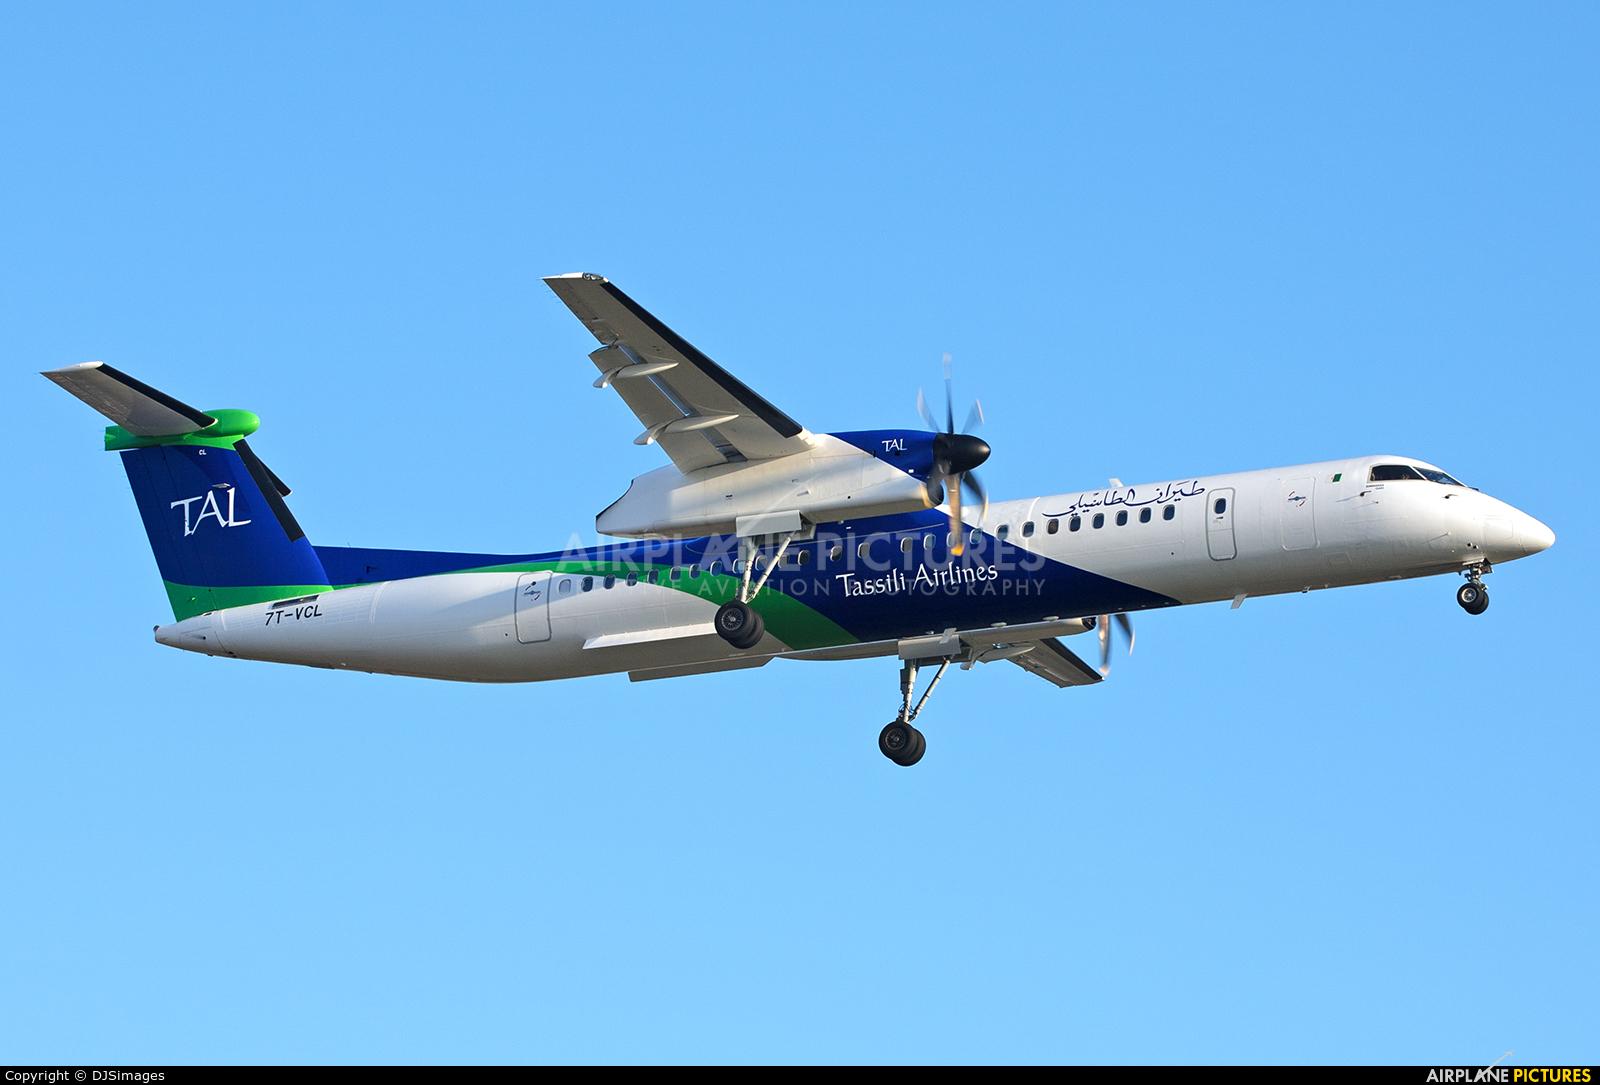 Tassili Airlines 7T-VCL aircraft at Birmingham